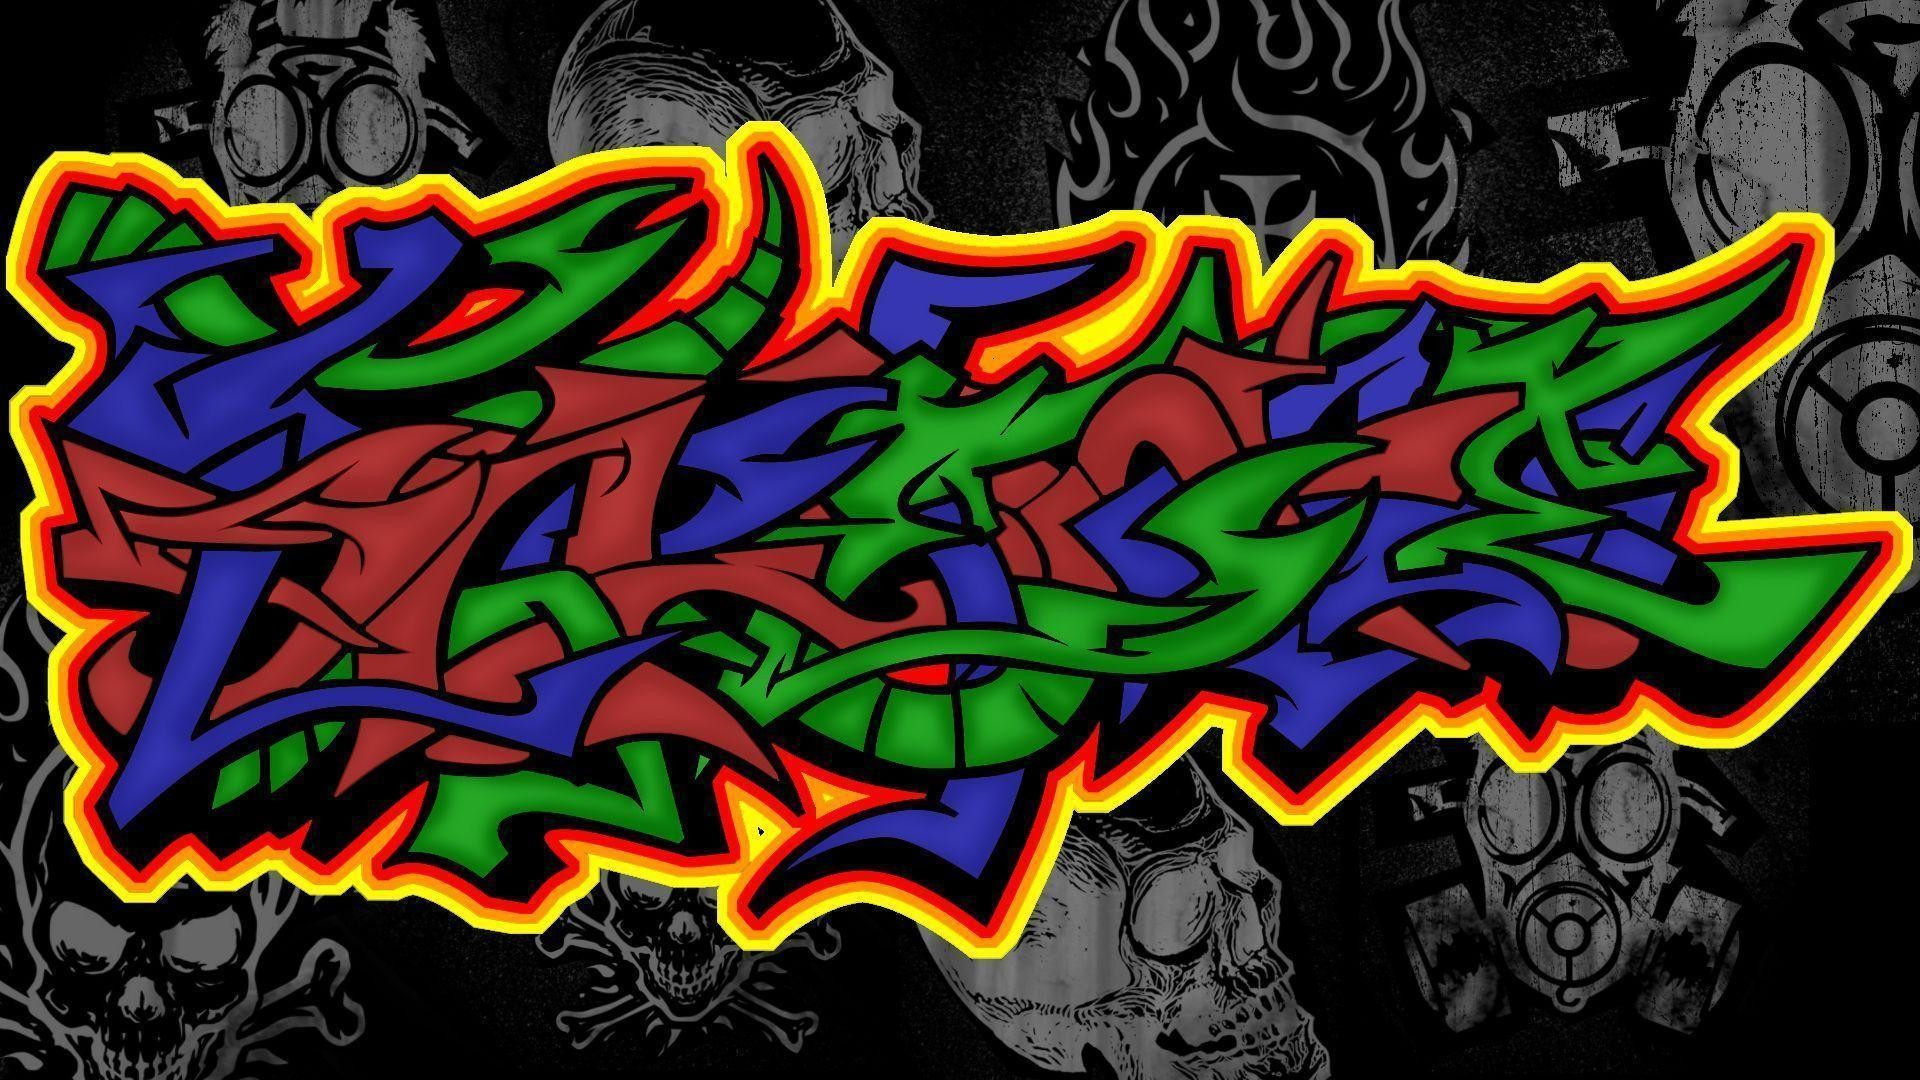 Abstract Graffiti Wallpapers – Wallpaper Cave